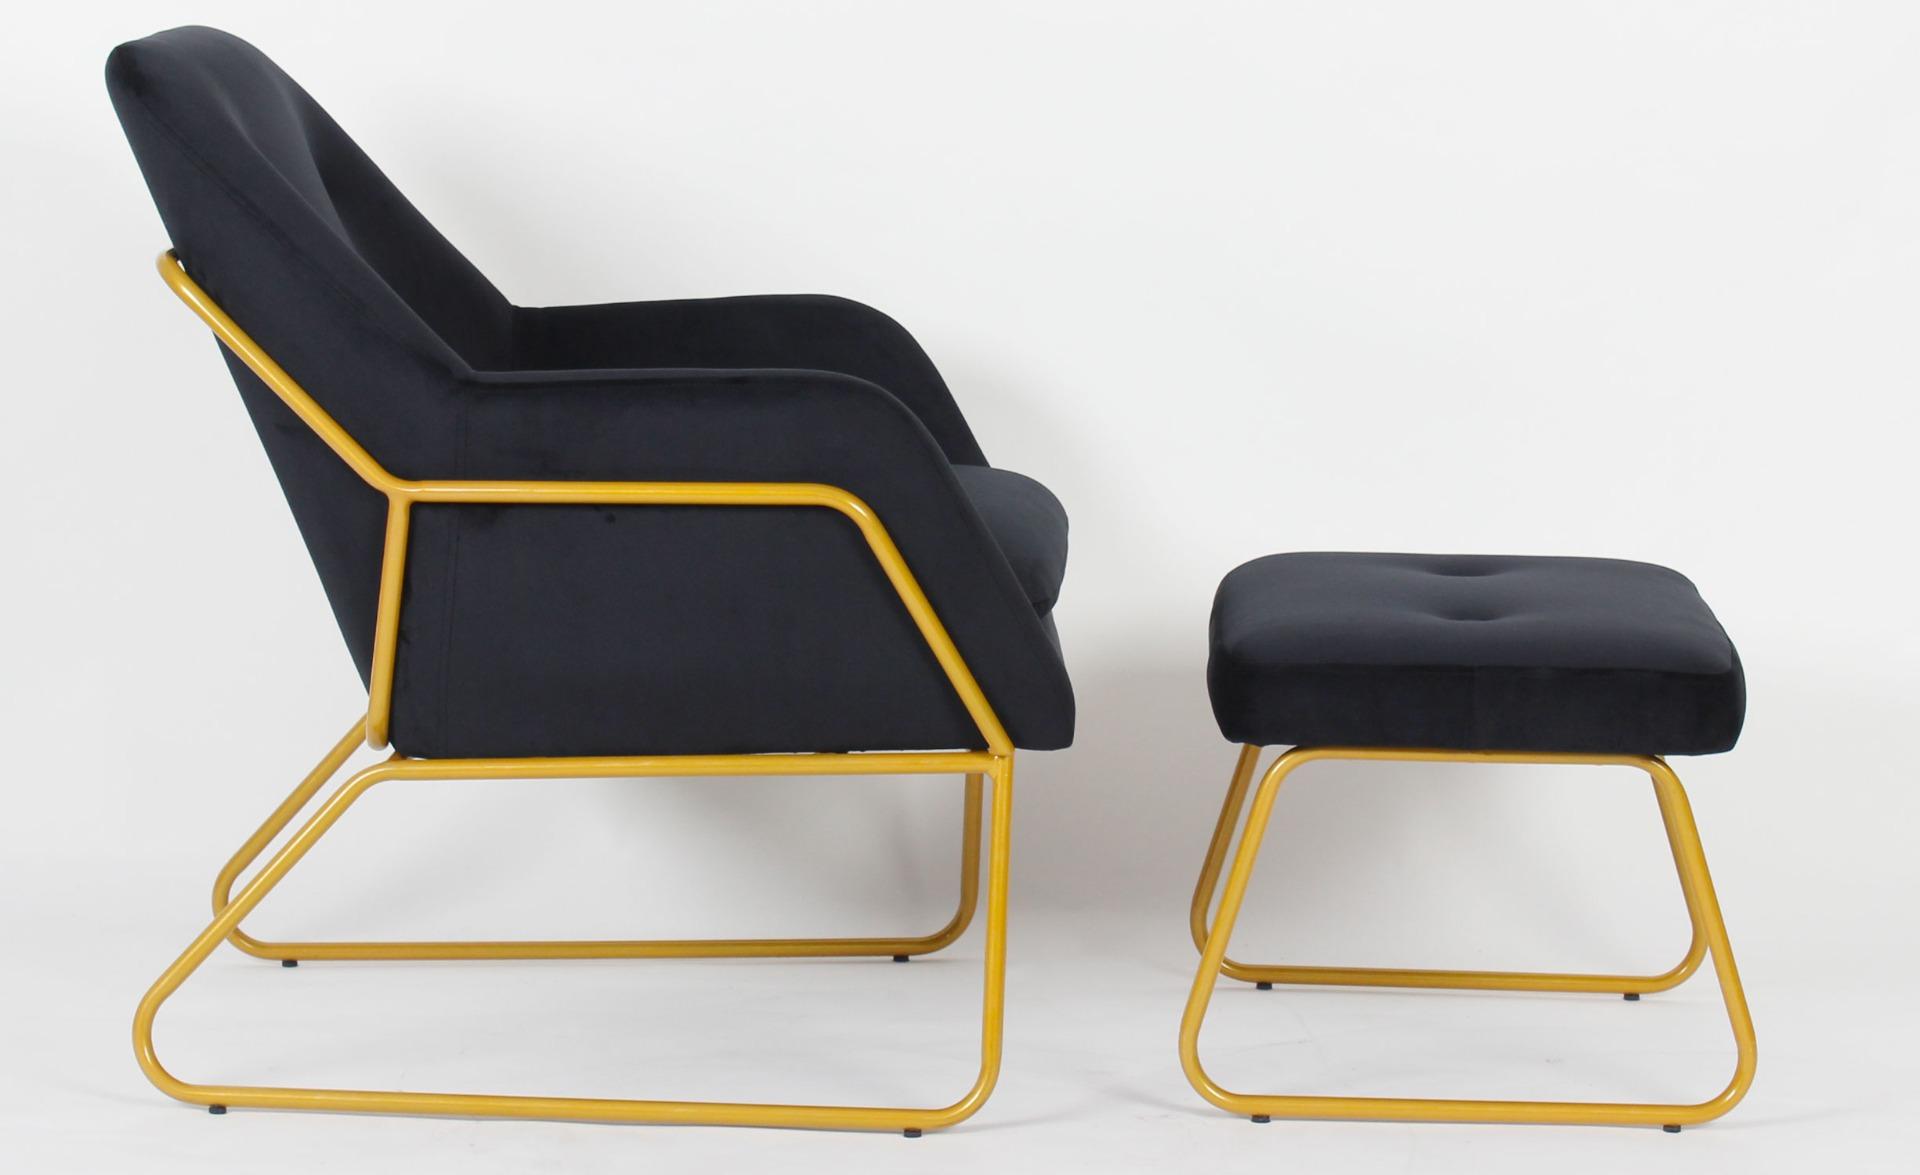 Eloi zwart fluwelen fauteuil + voetenbank